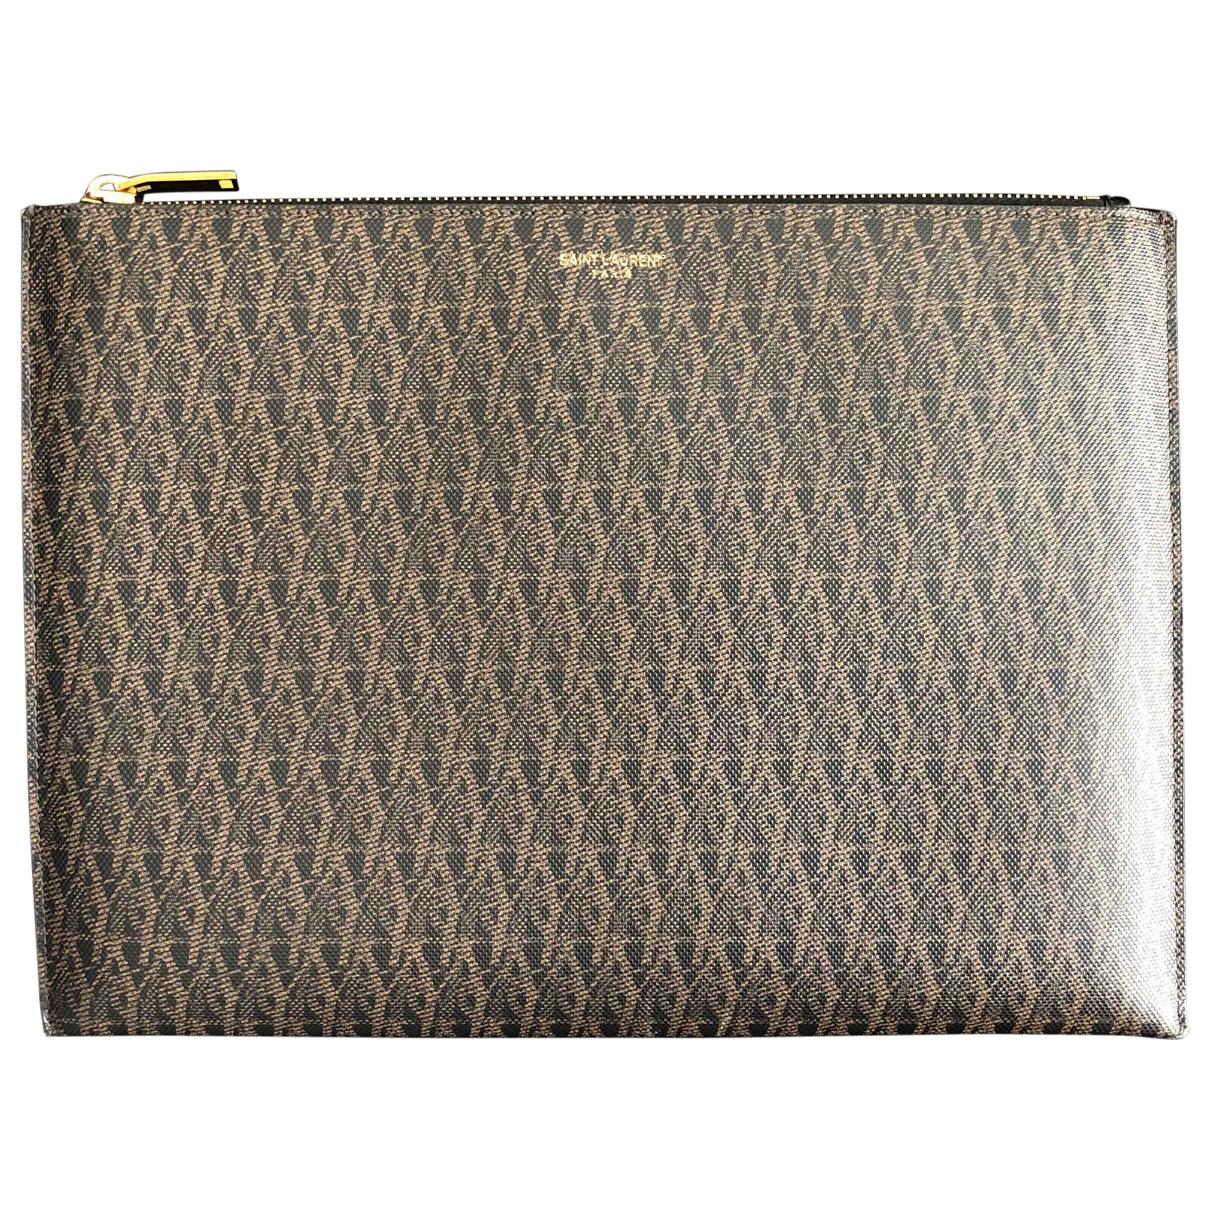 Saint Laurent \N Brown Cloth Clutch bag for Women \N